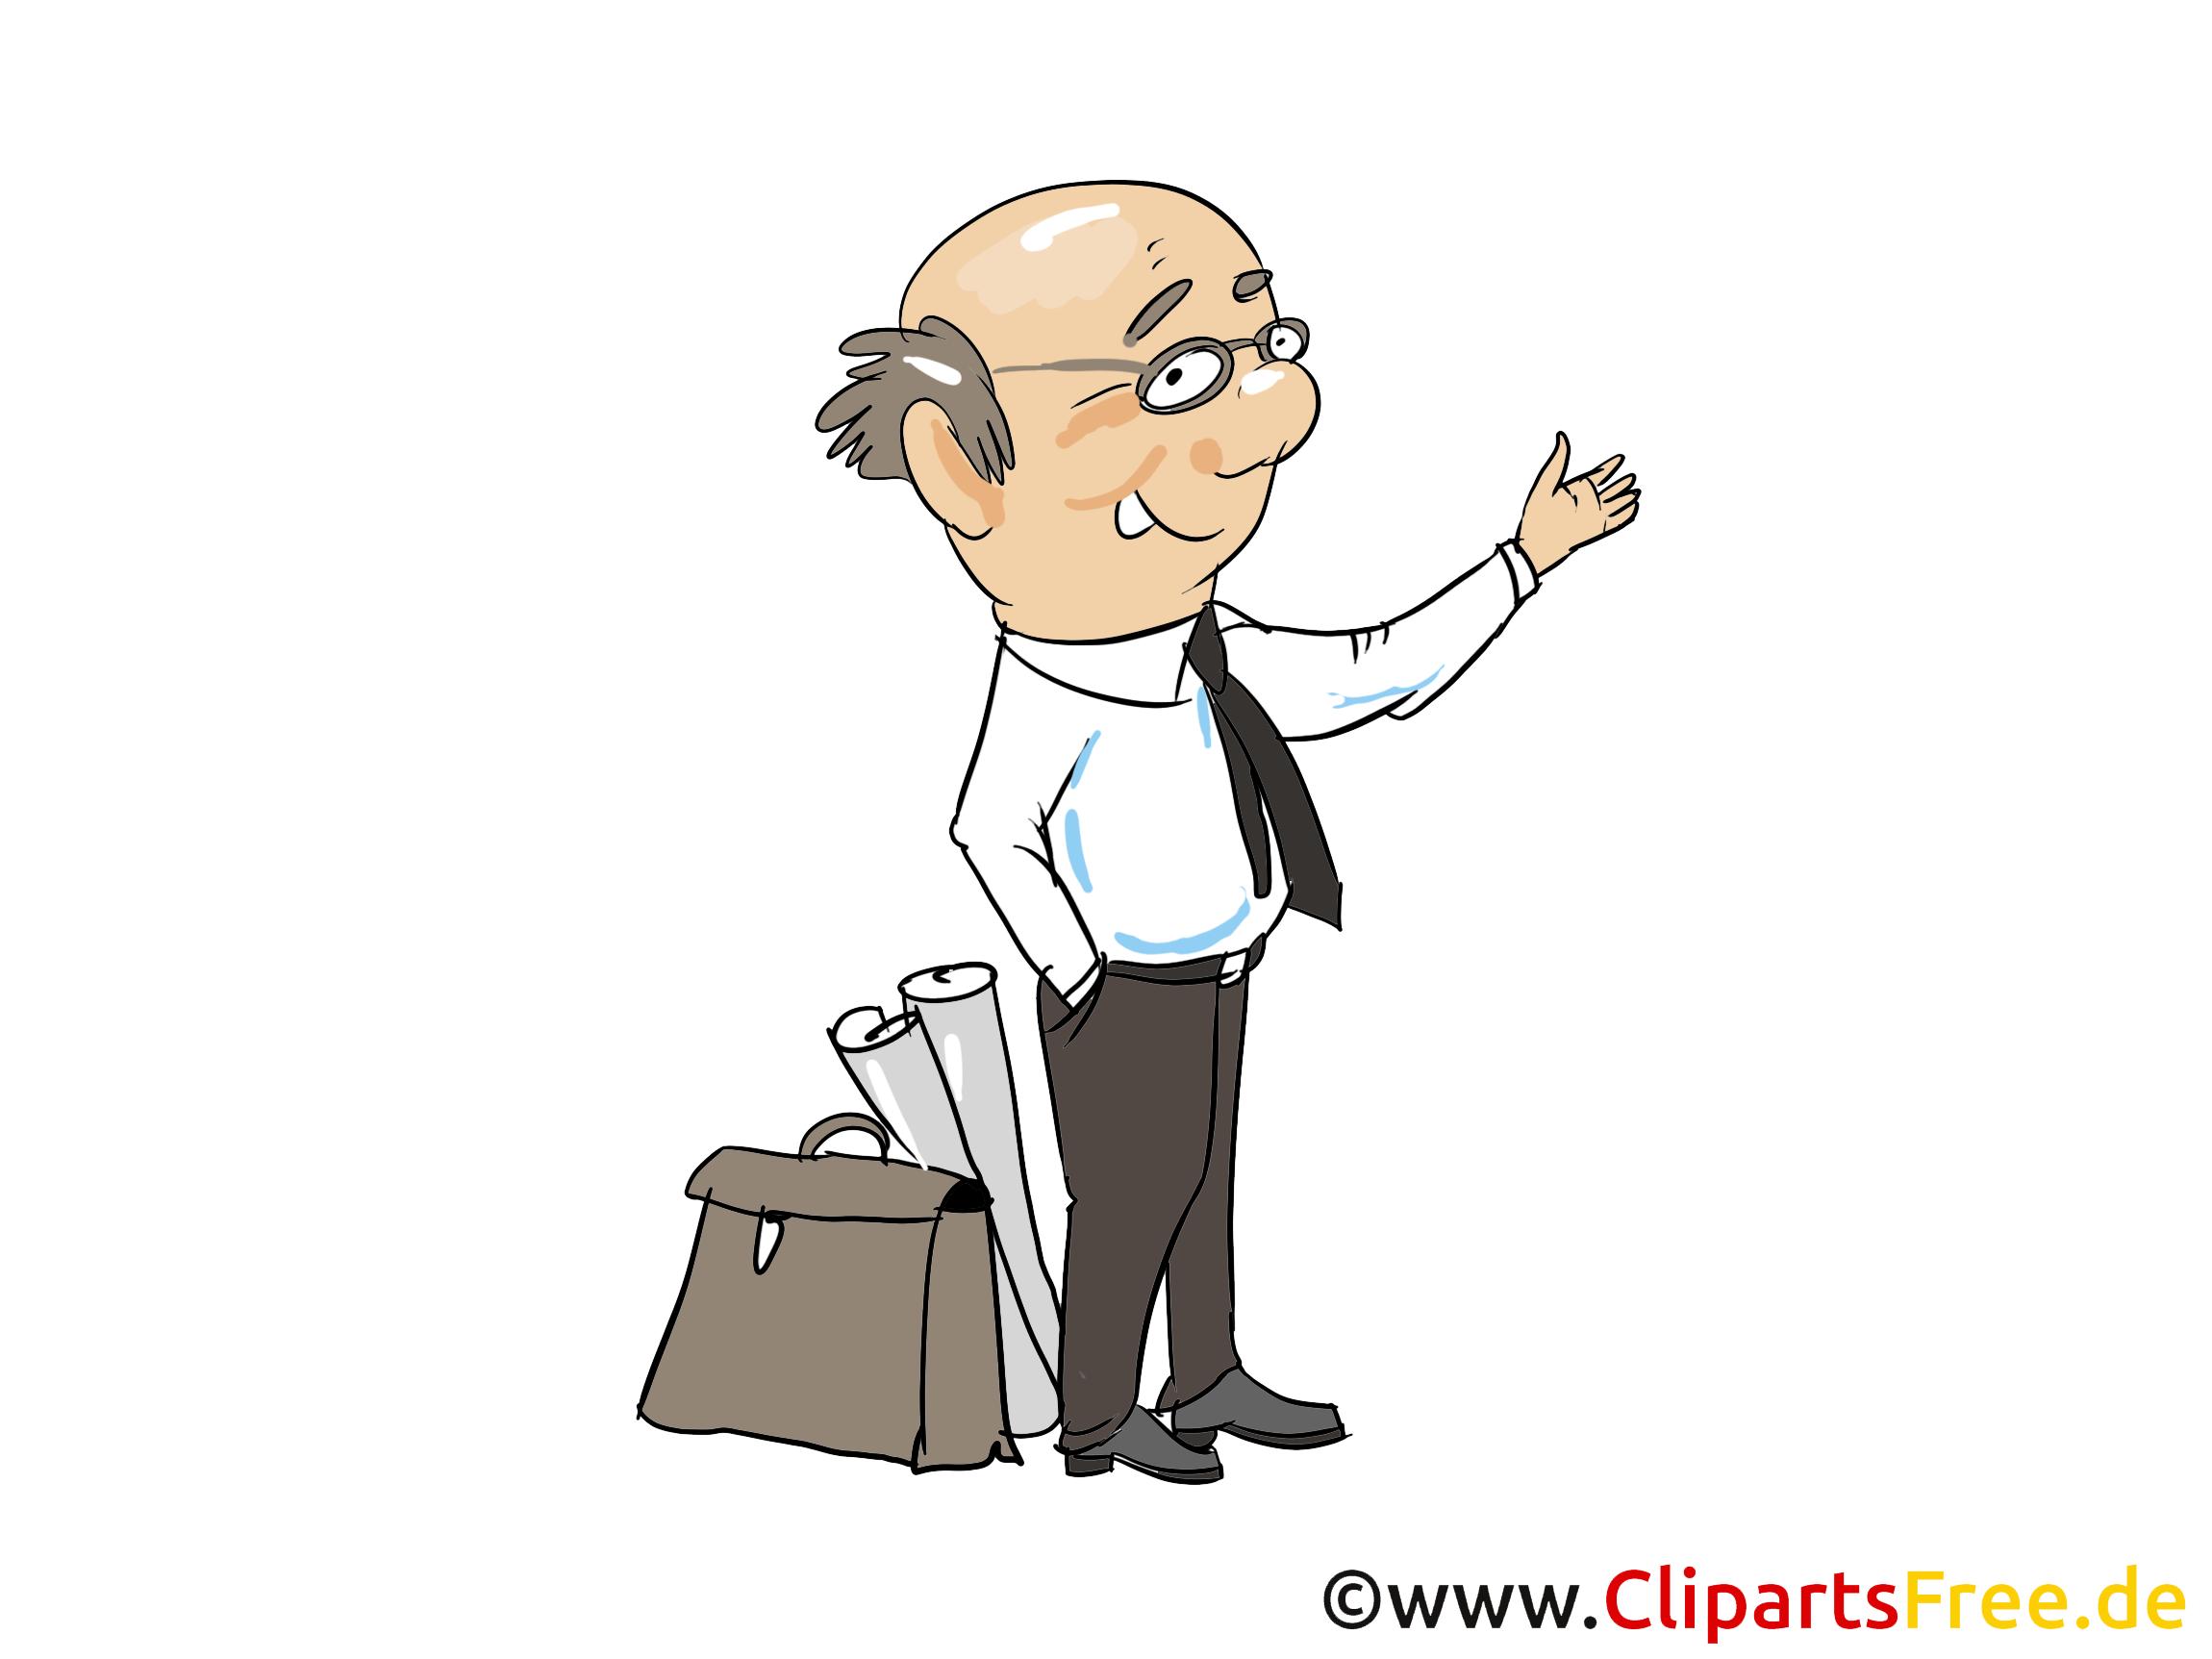 Steuerberater Clipart, Bild, Grafik, Cartoon gratis